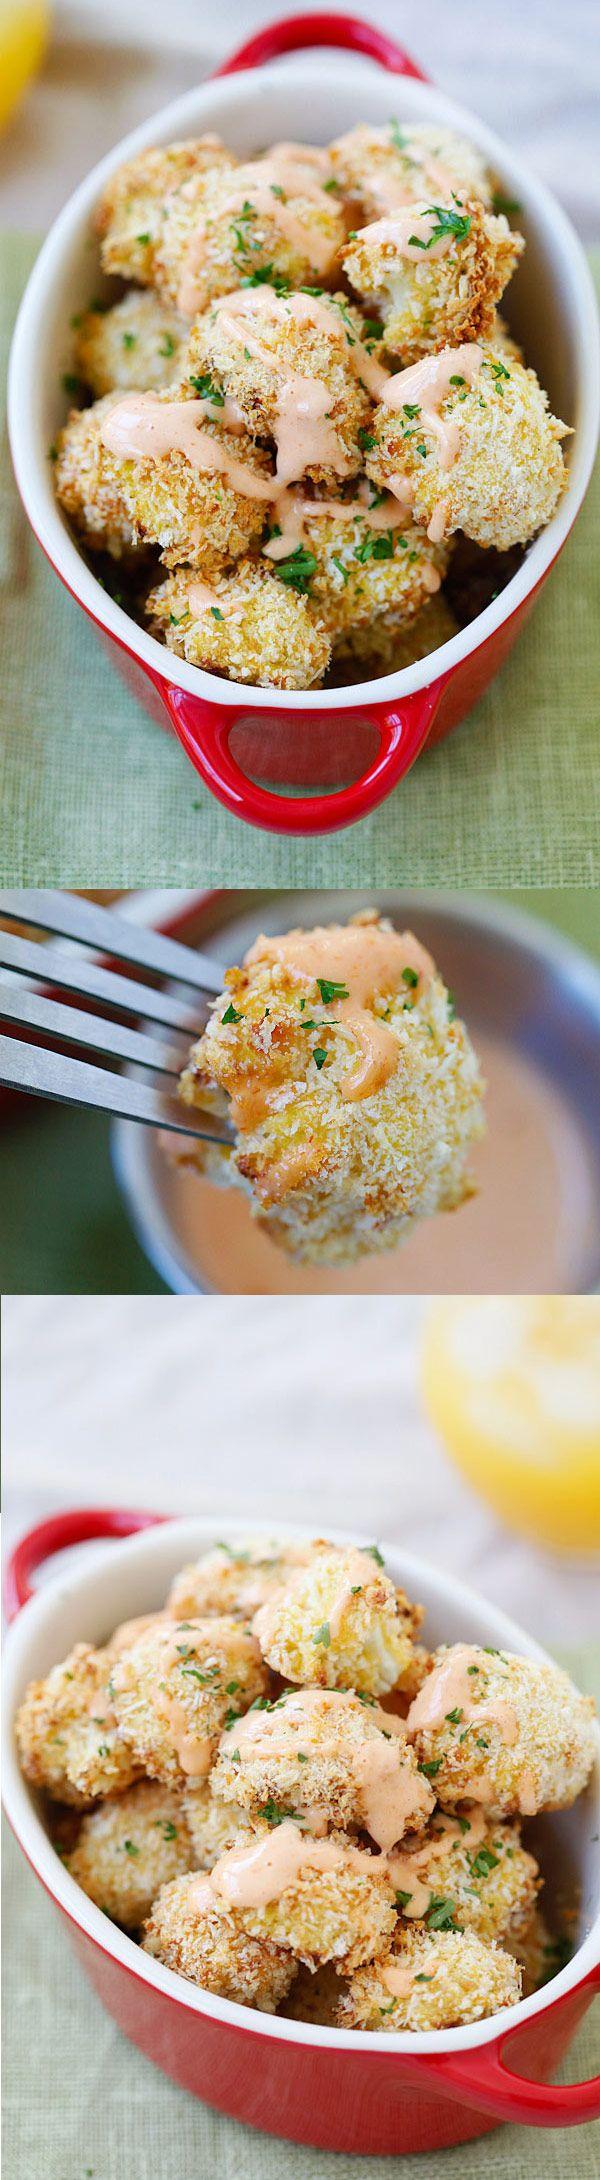 Parmesan Baked Cauliflower – crispy, healthy cauliflower coated with Parmesan cheese and panko bread crumbs. Easy, yummy and so good! | rasamalaysia.com